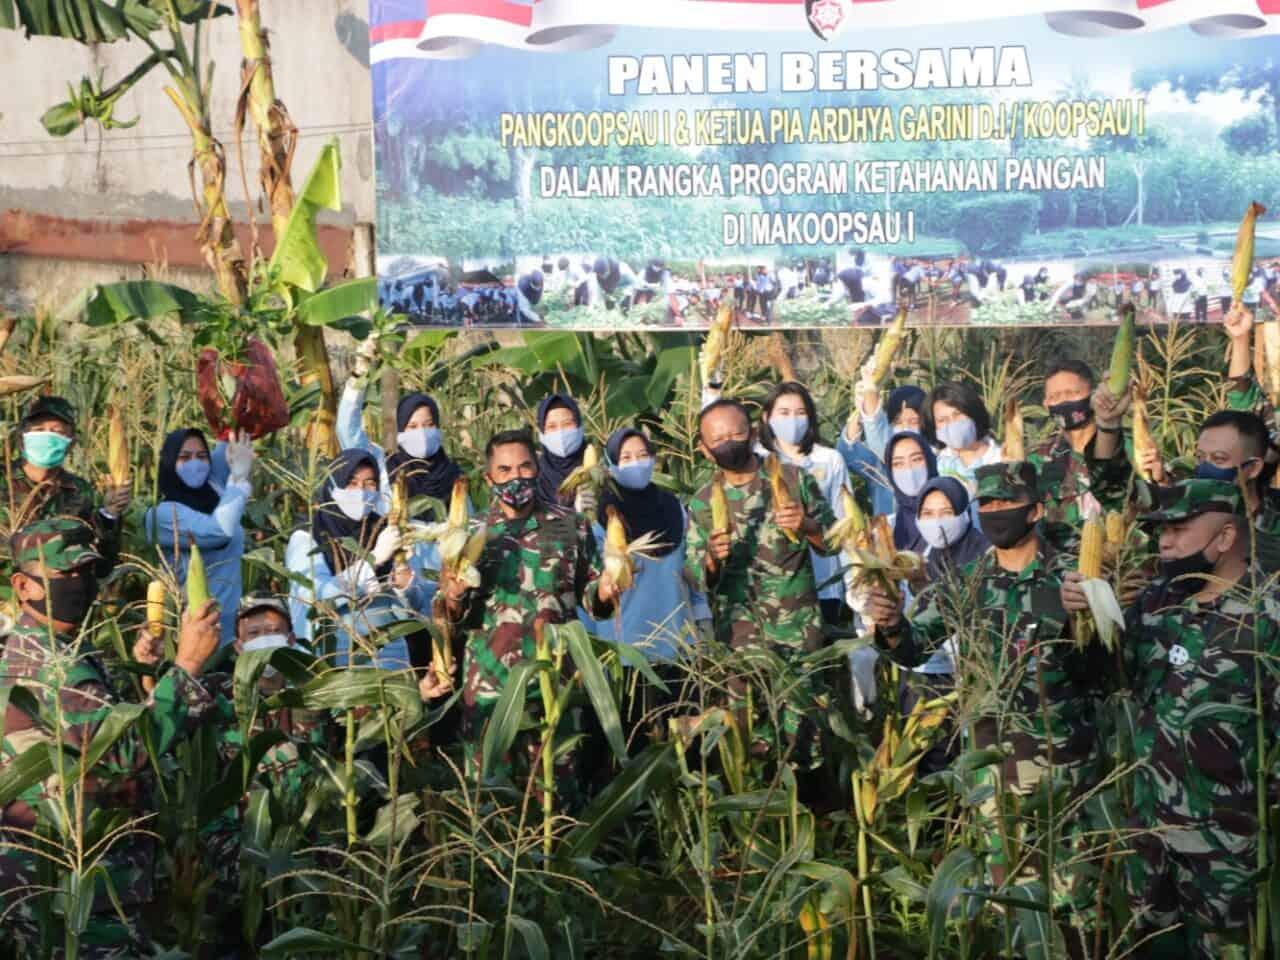 Pangkoopsau I, Panen Perdana di Lahan Ketahanan Pangan Makoopsau I